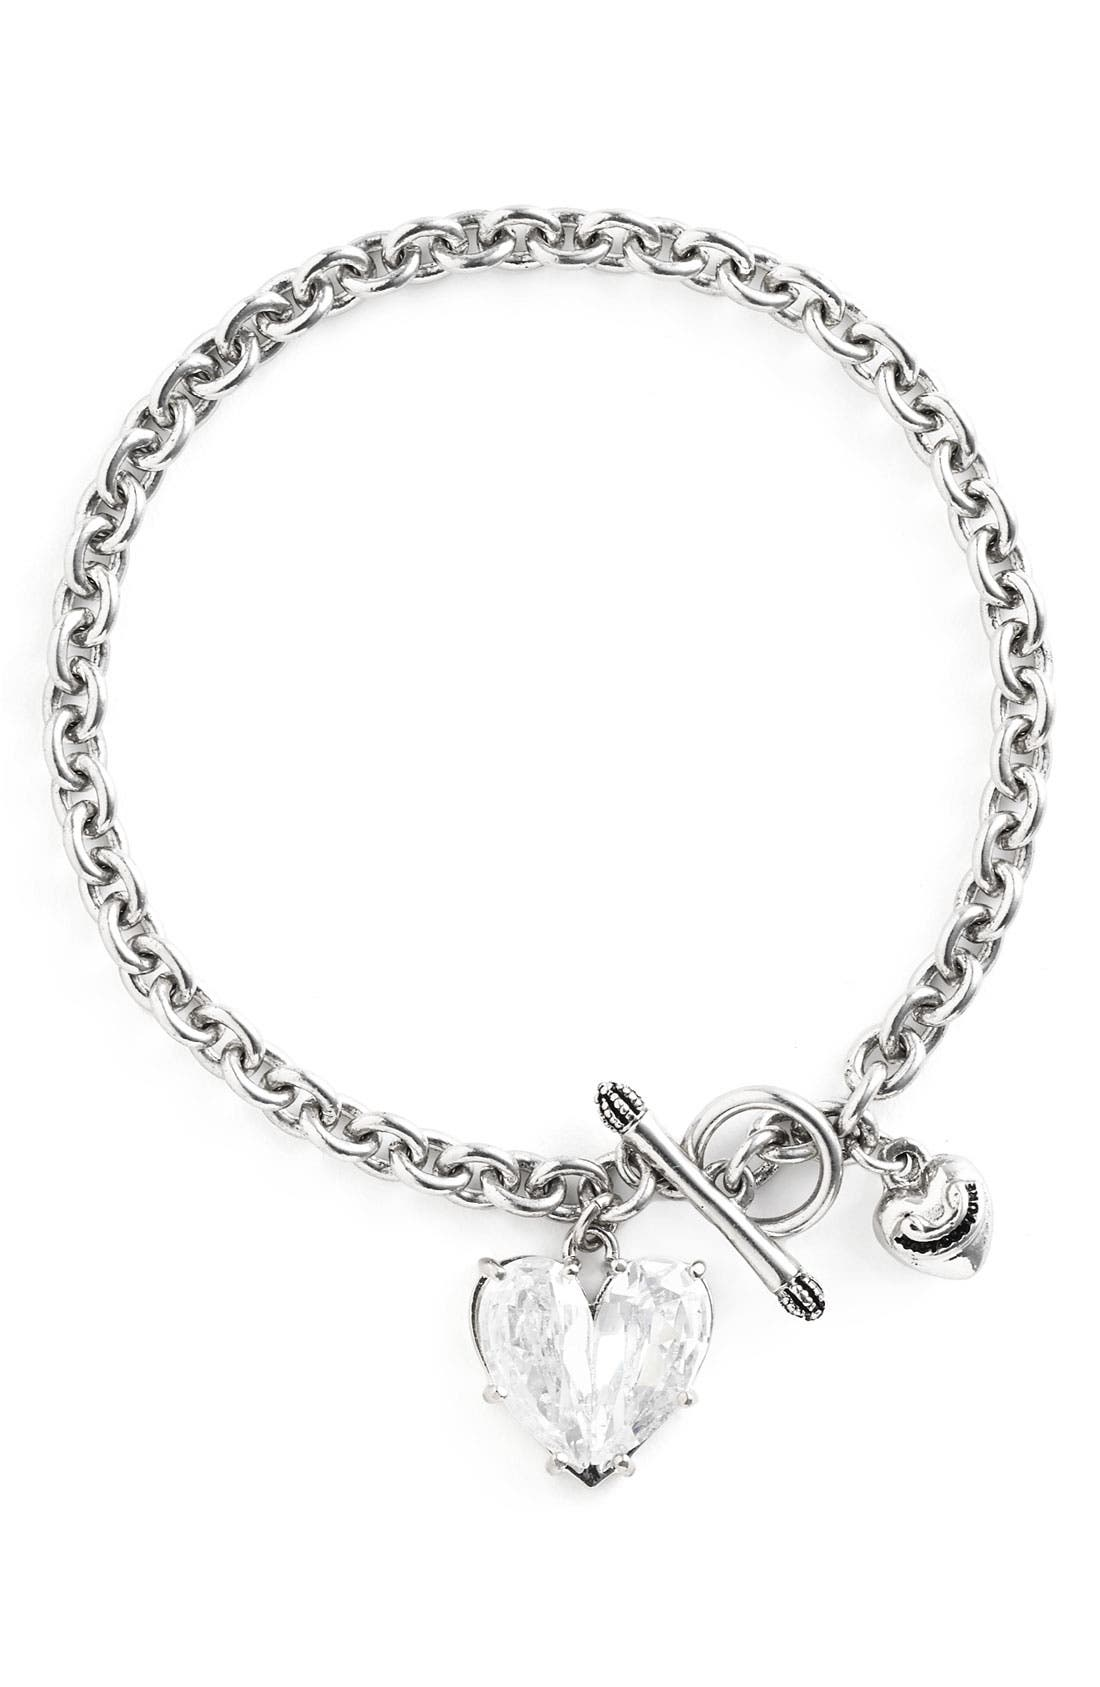 Main Image - Juicy Couture 'Juicy Icons CZ Wish' Bracelet